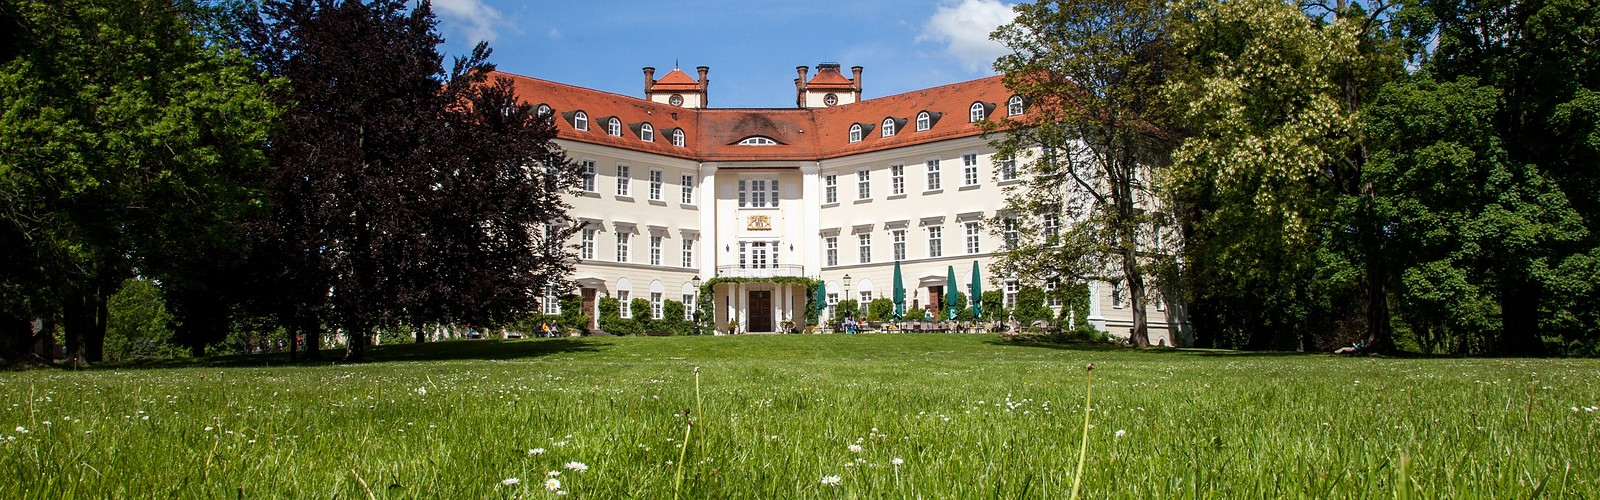 Schloss Lübbenau, photo: TMB-Fotoarchiv/Peter Becker